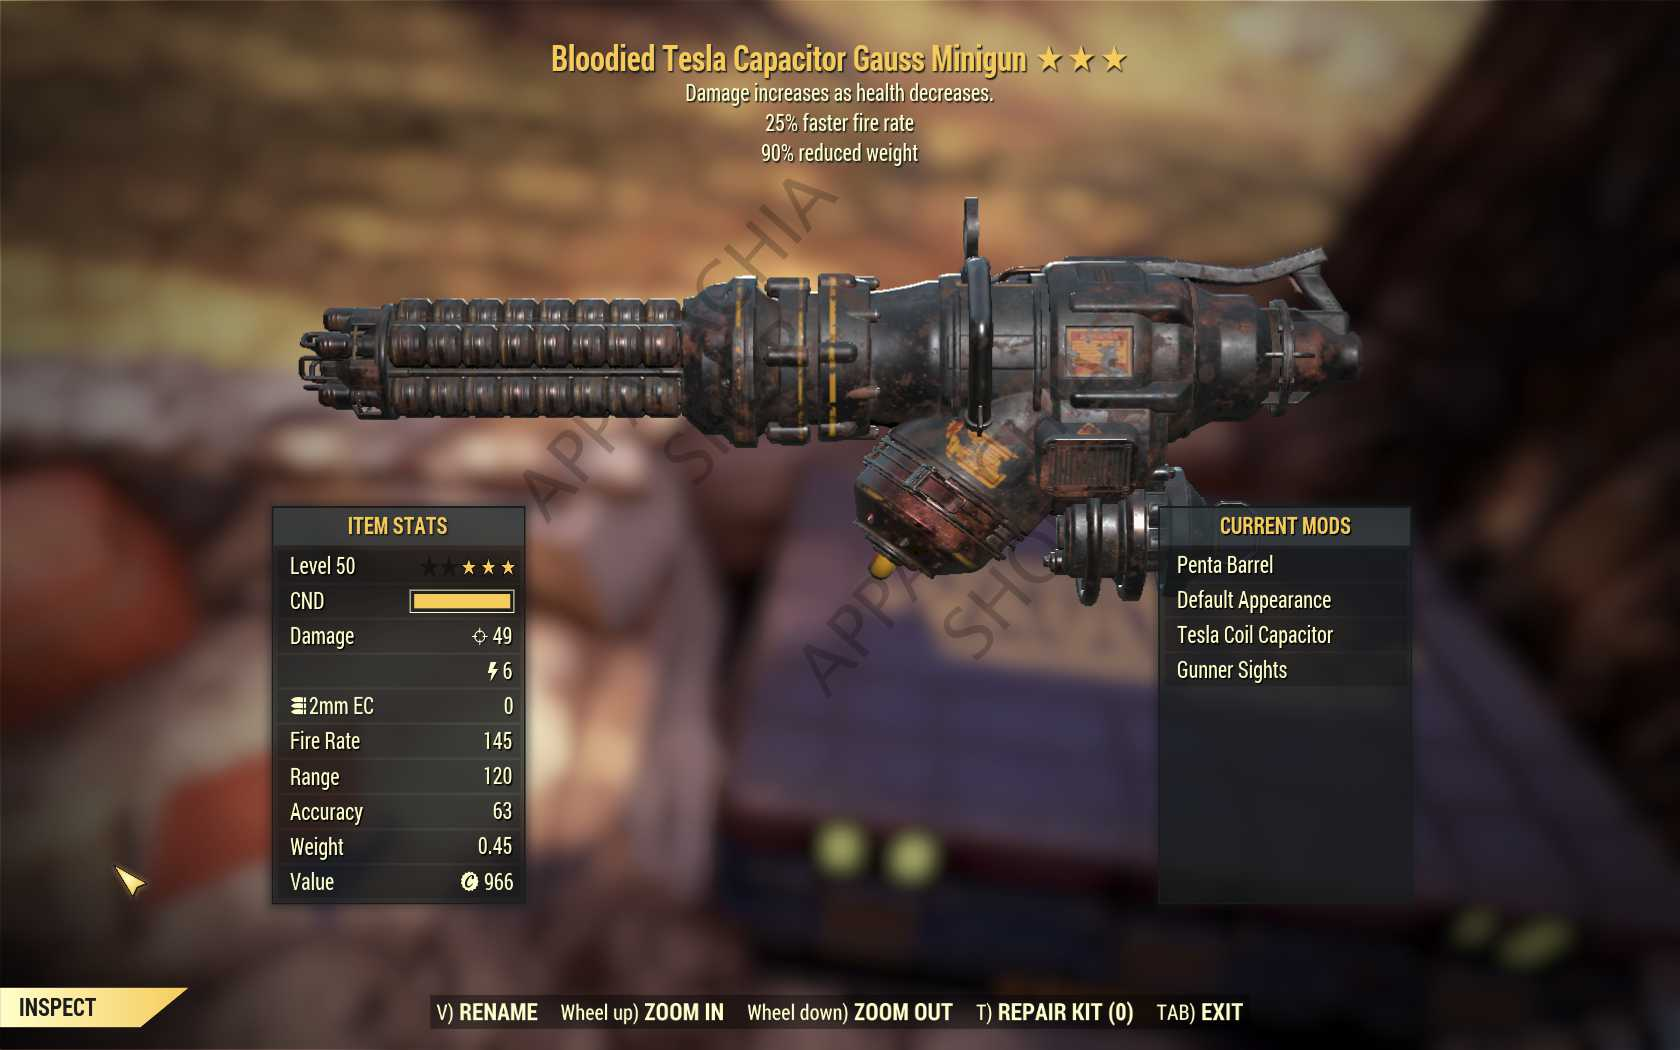 Bloodied Gauss Minigun (25% faster fire rate, 90% reduced weight) FULL MODDED [Wastelanders]